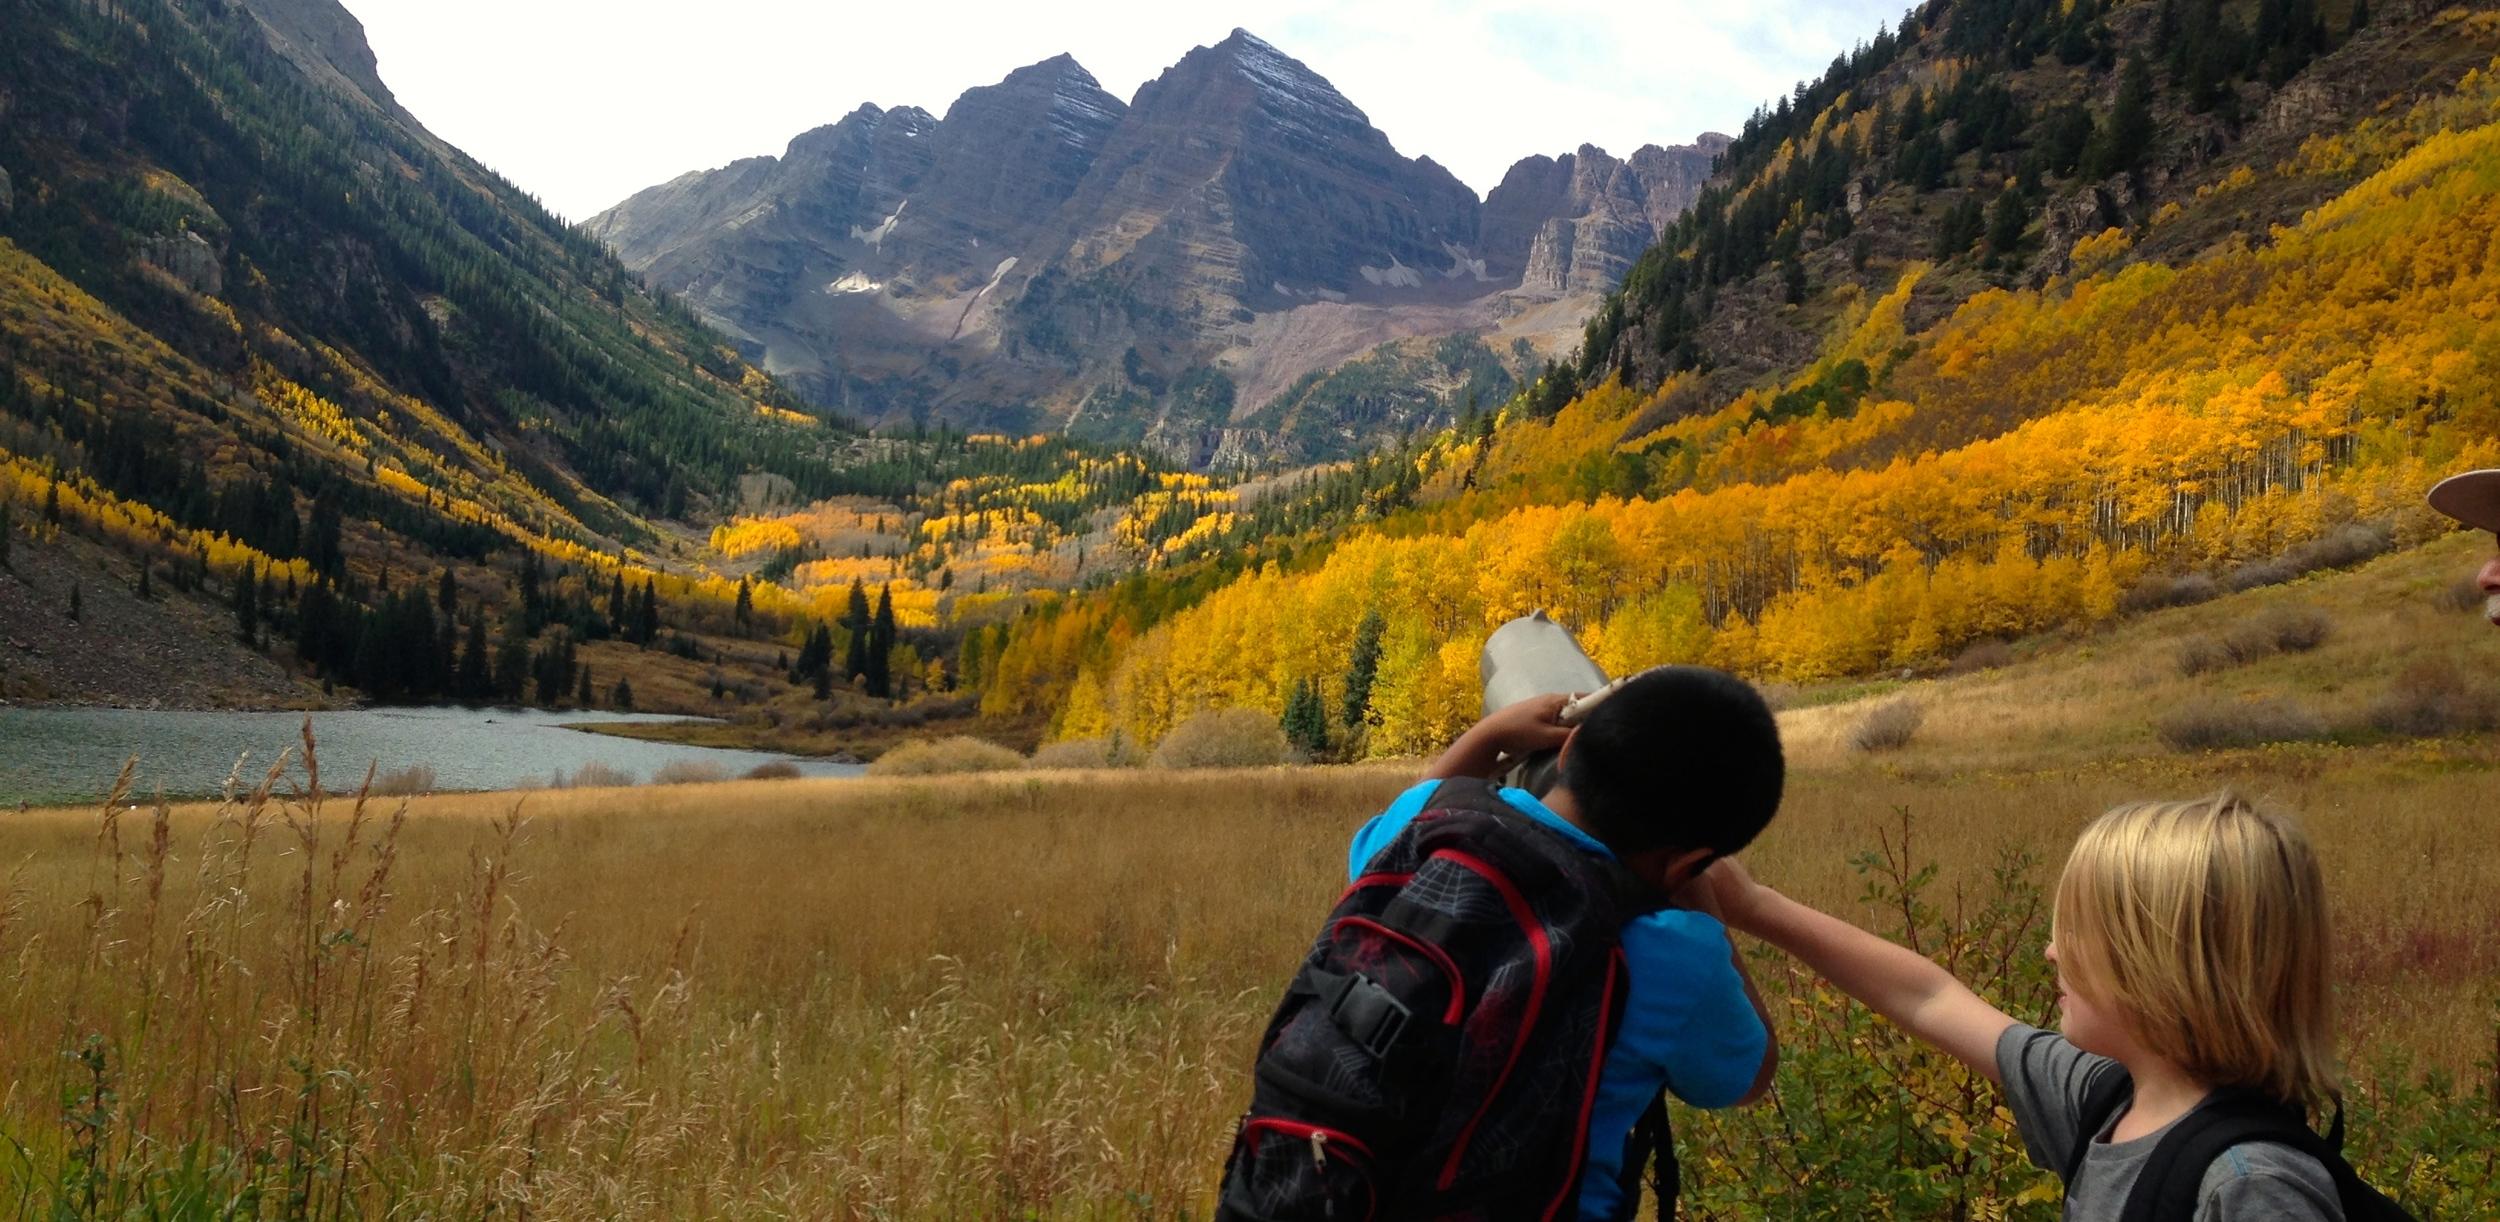 Third grade students explore the Maroon Bells on a field trip. November 2015.